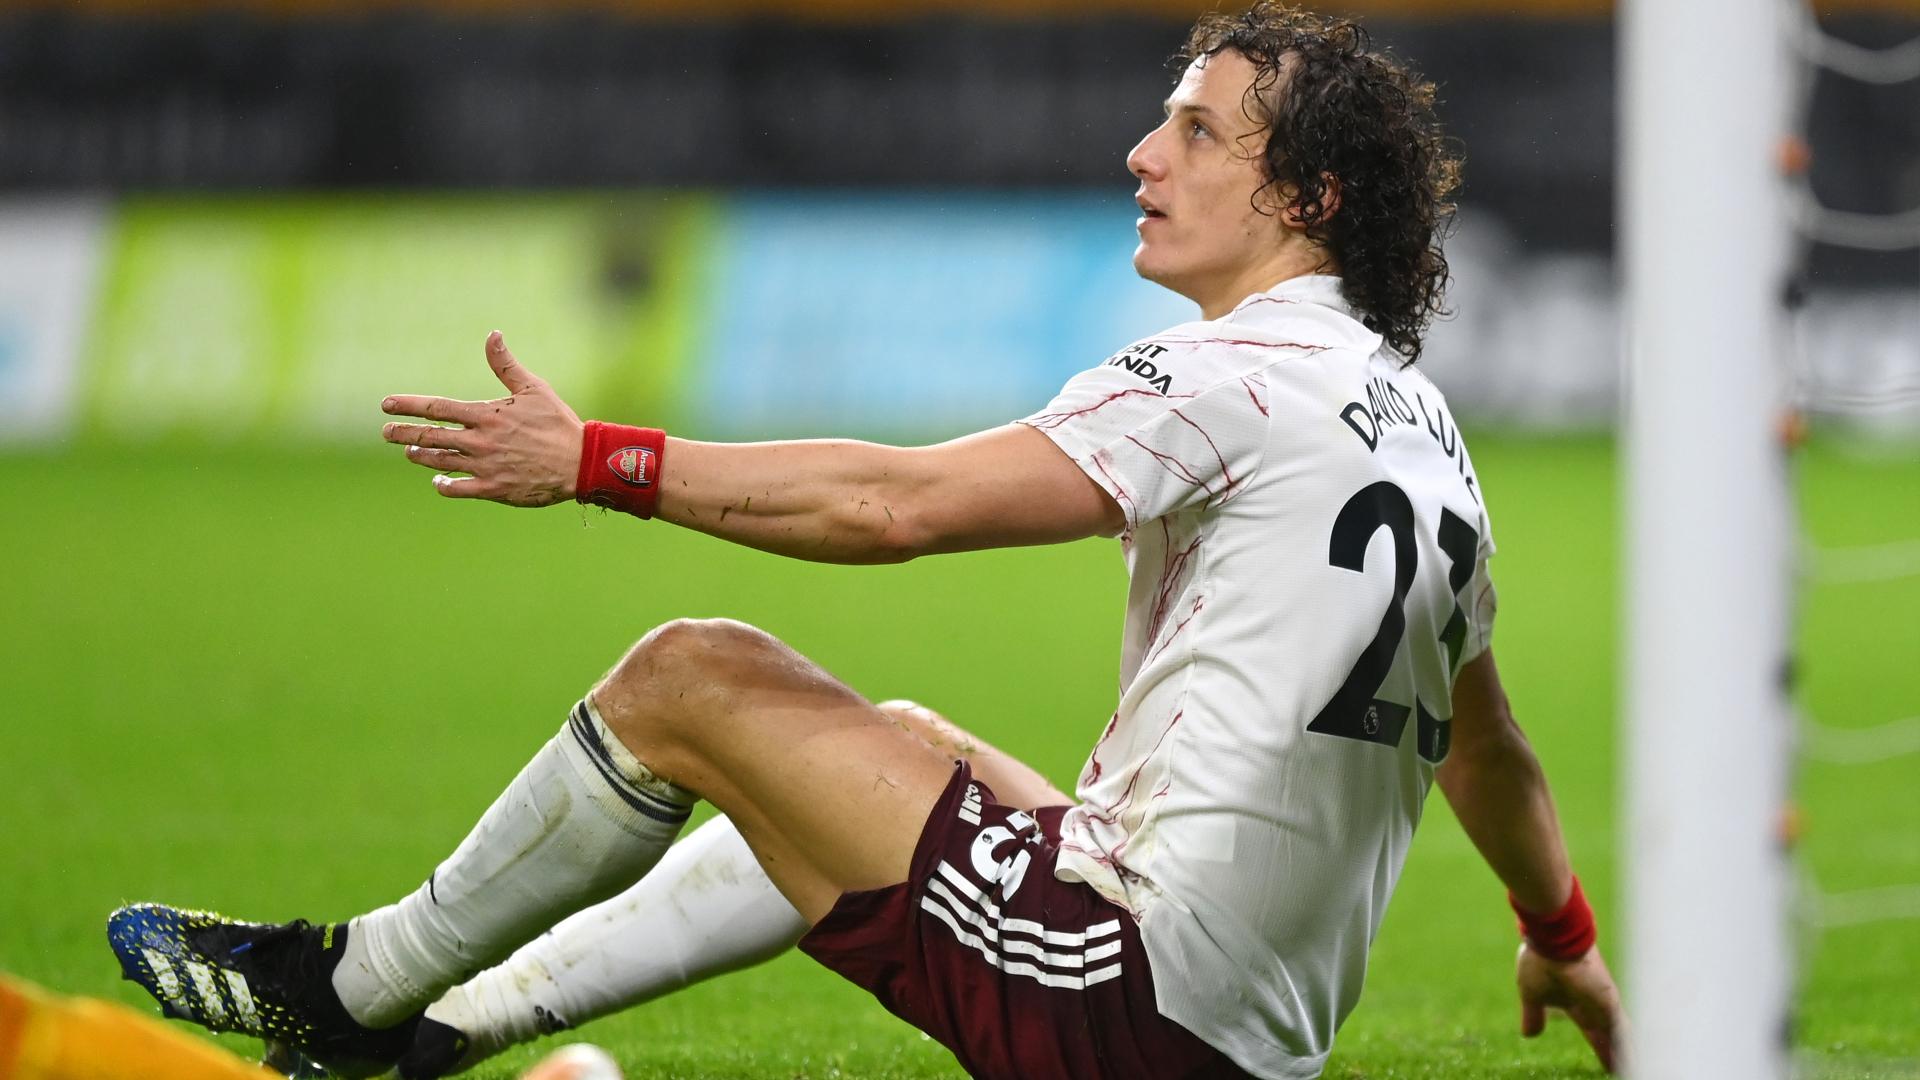 Wolves vs Arsenal: Arteta gives injury updates on Saka, Lacazette, Tierney